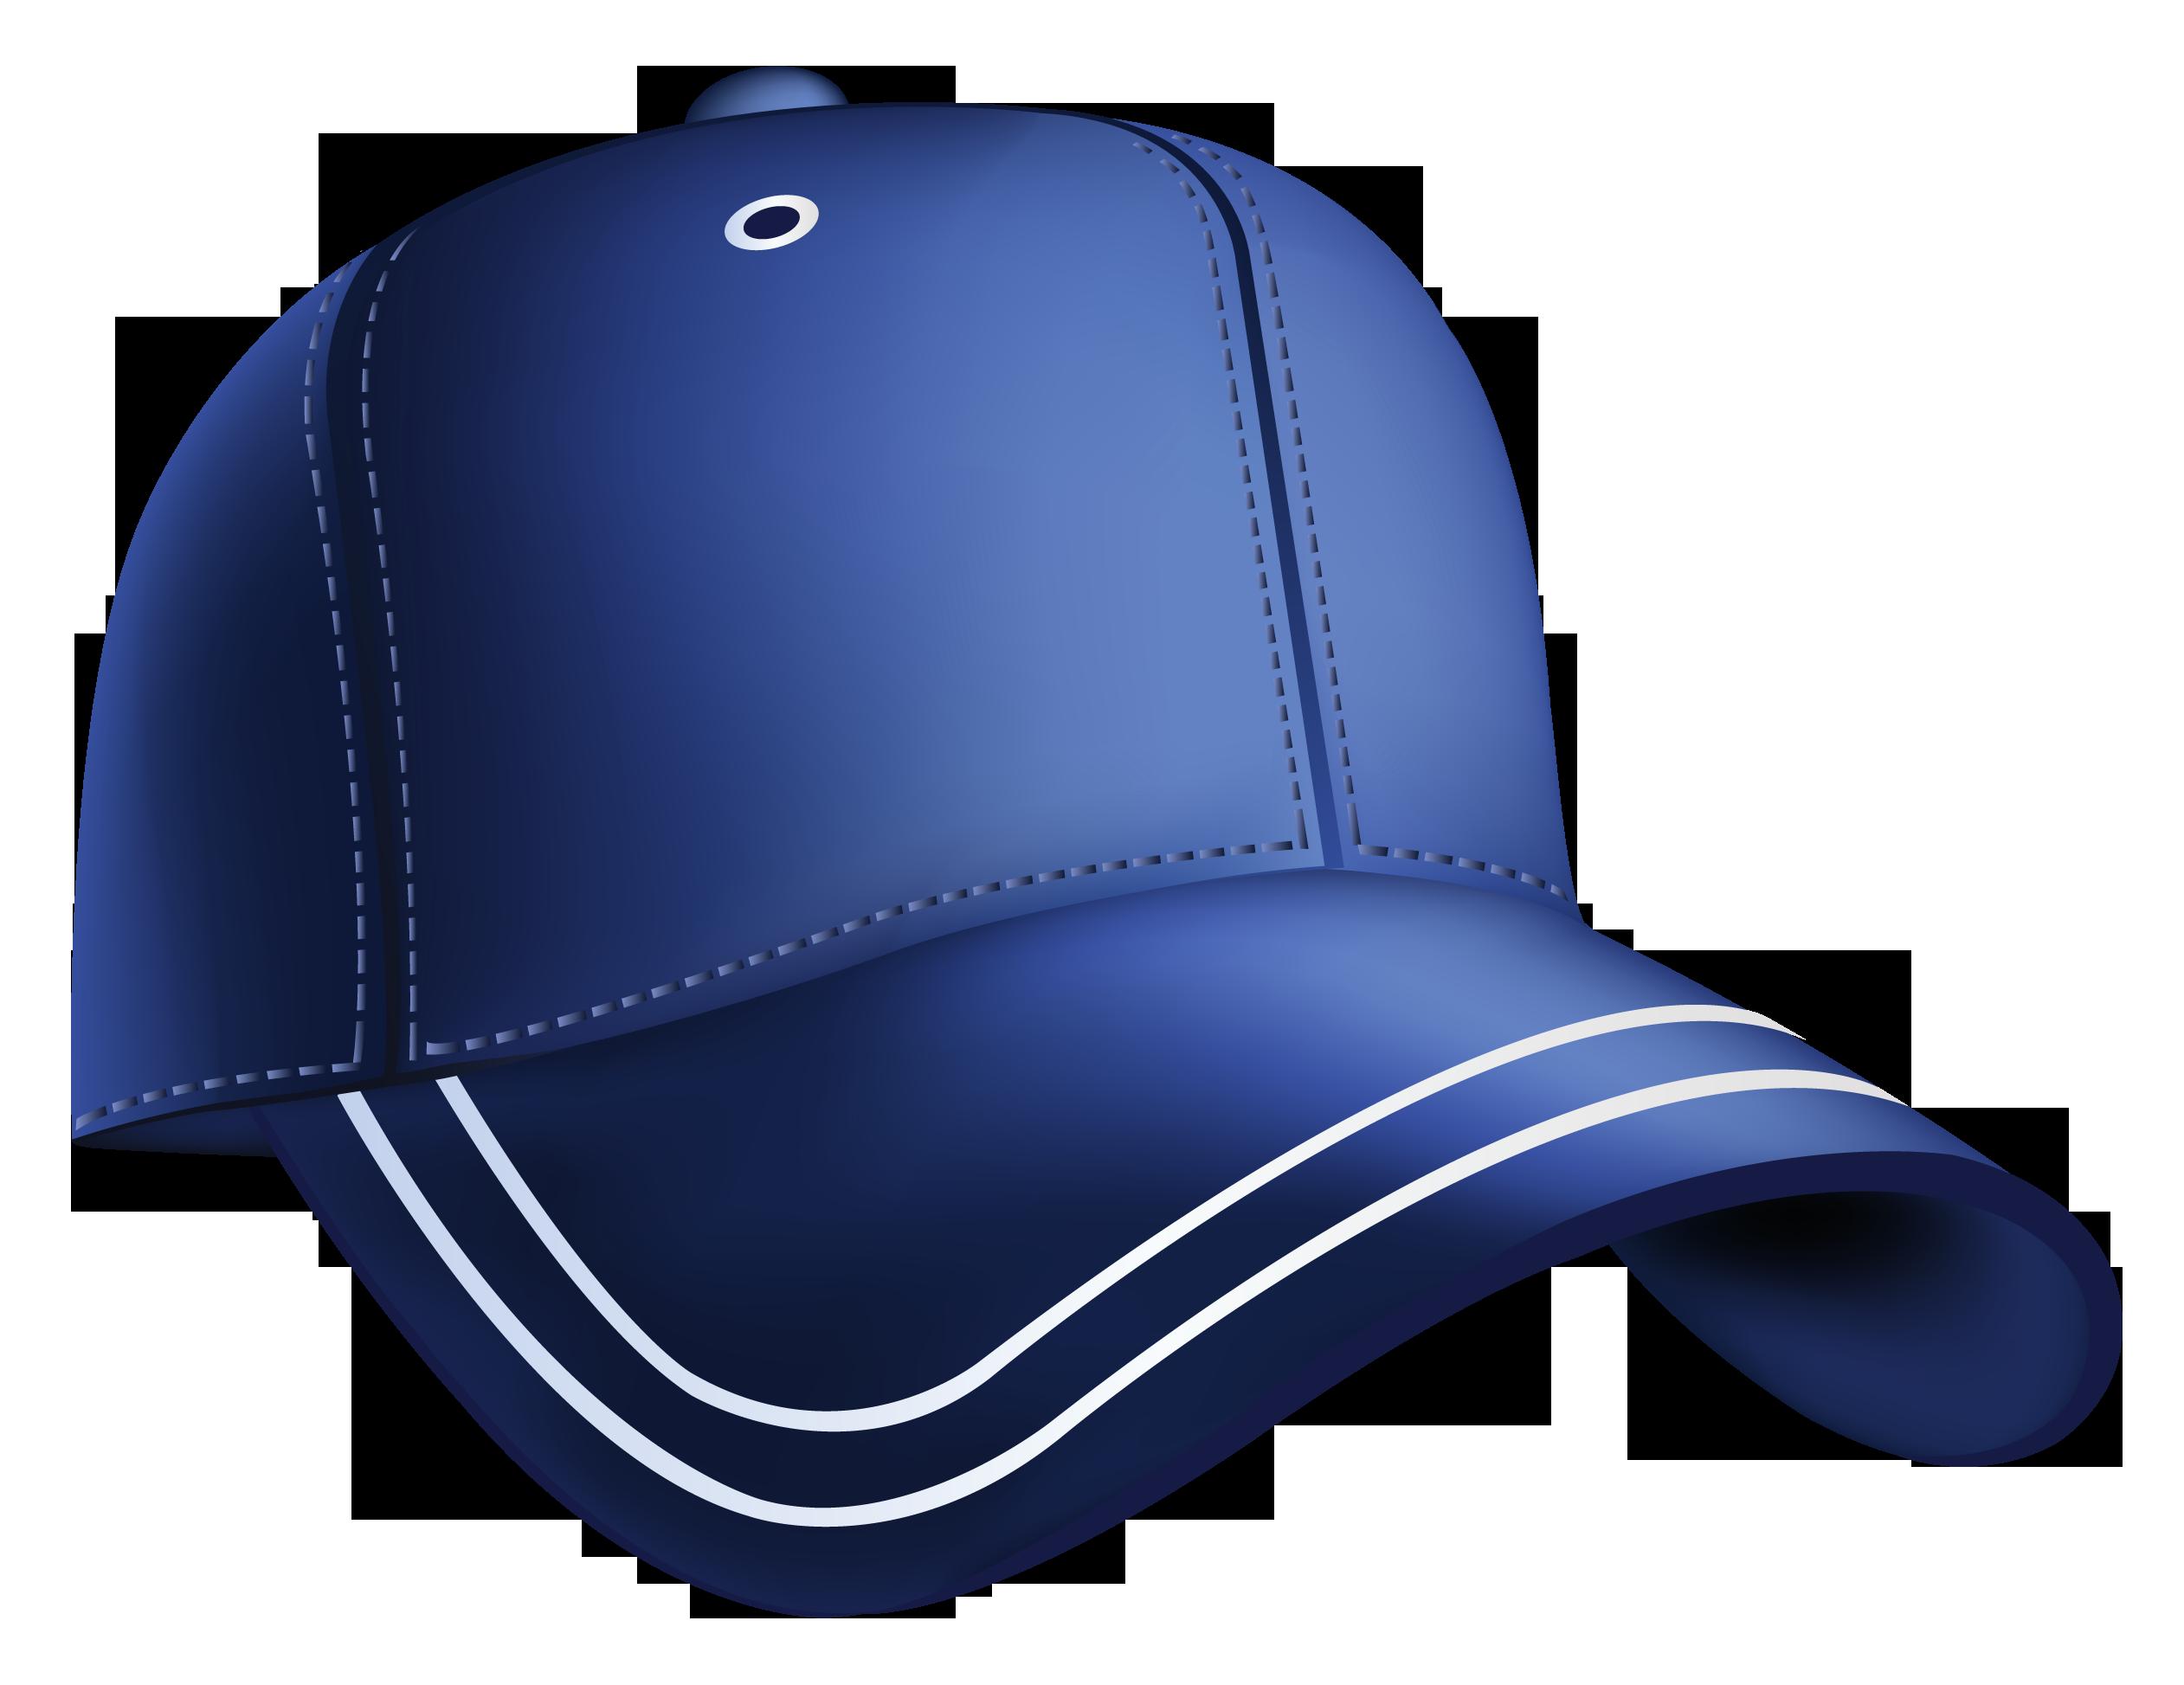 Clipart baseball hat clipart